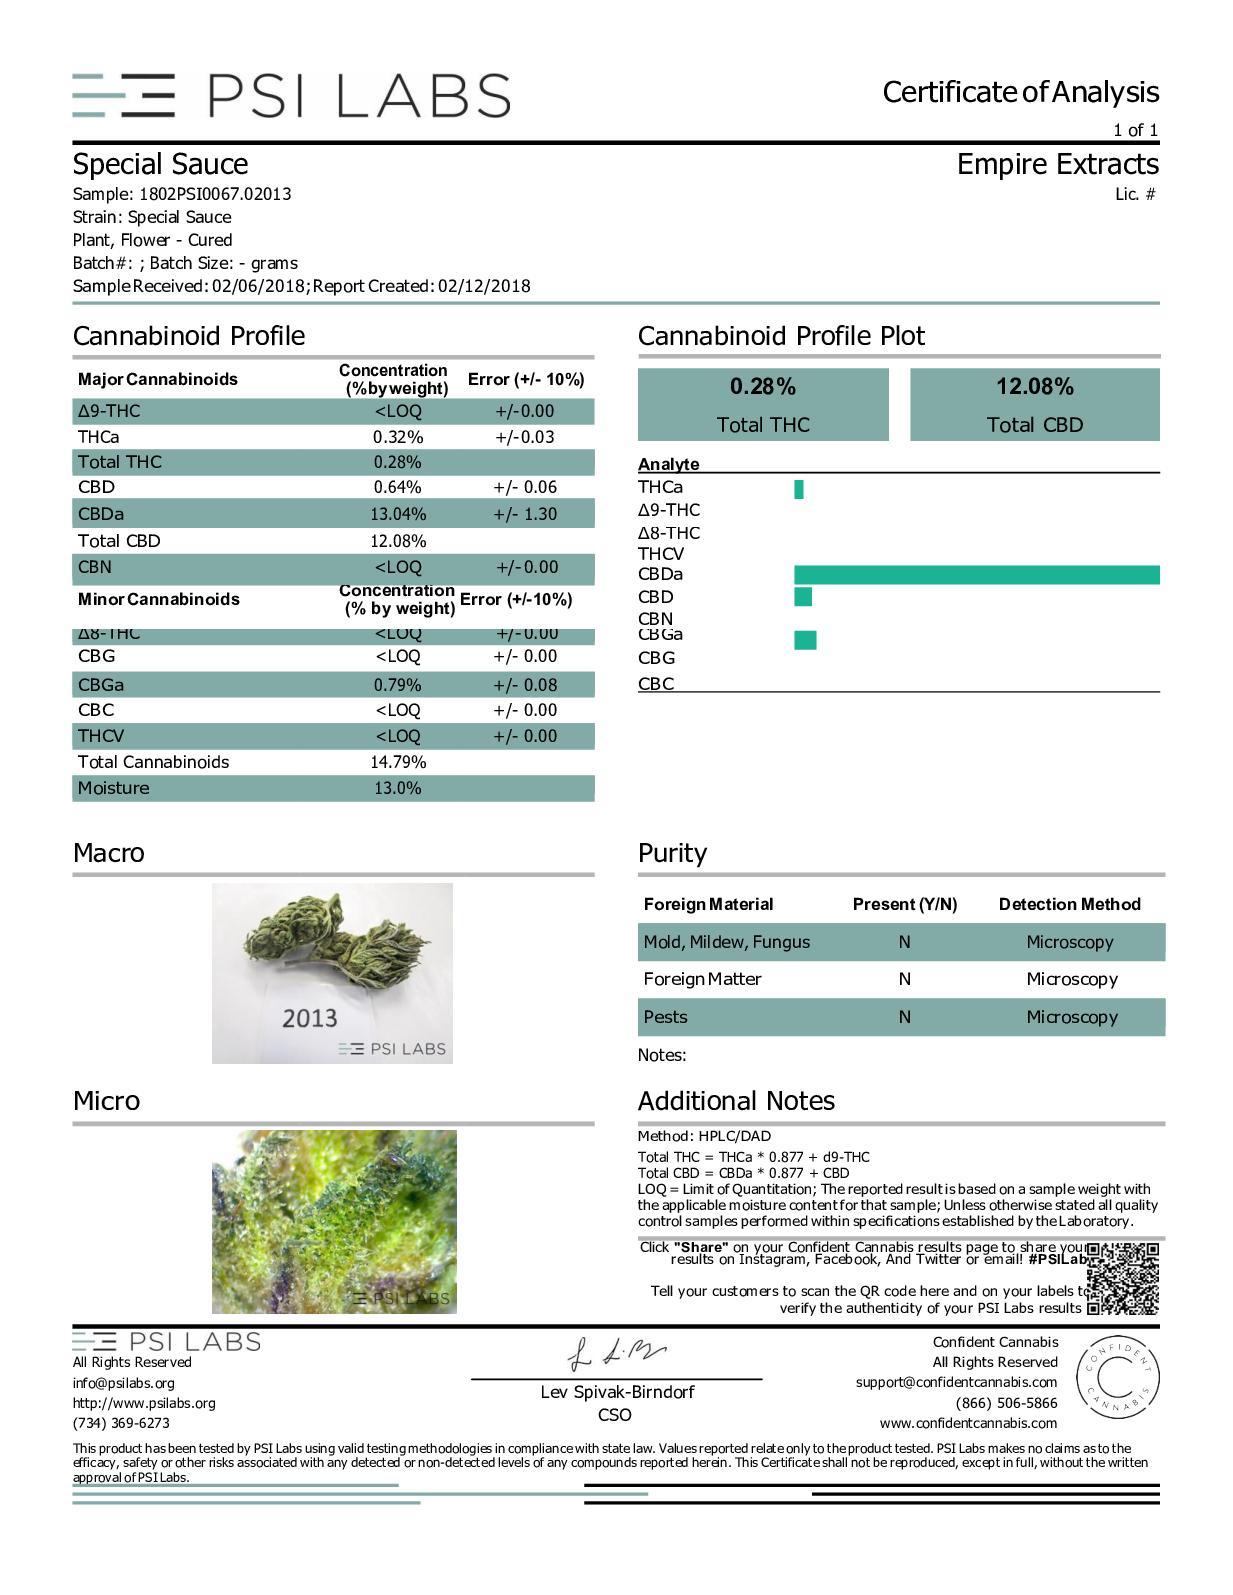 Calaméo - BUY WEED ONLINE AUSTRALIA